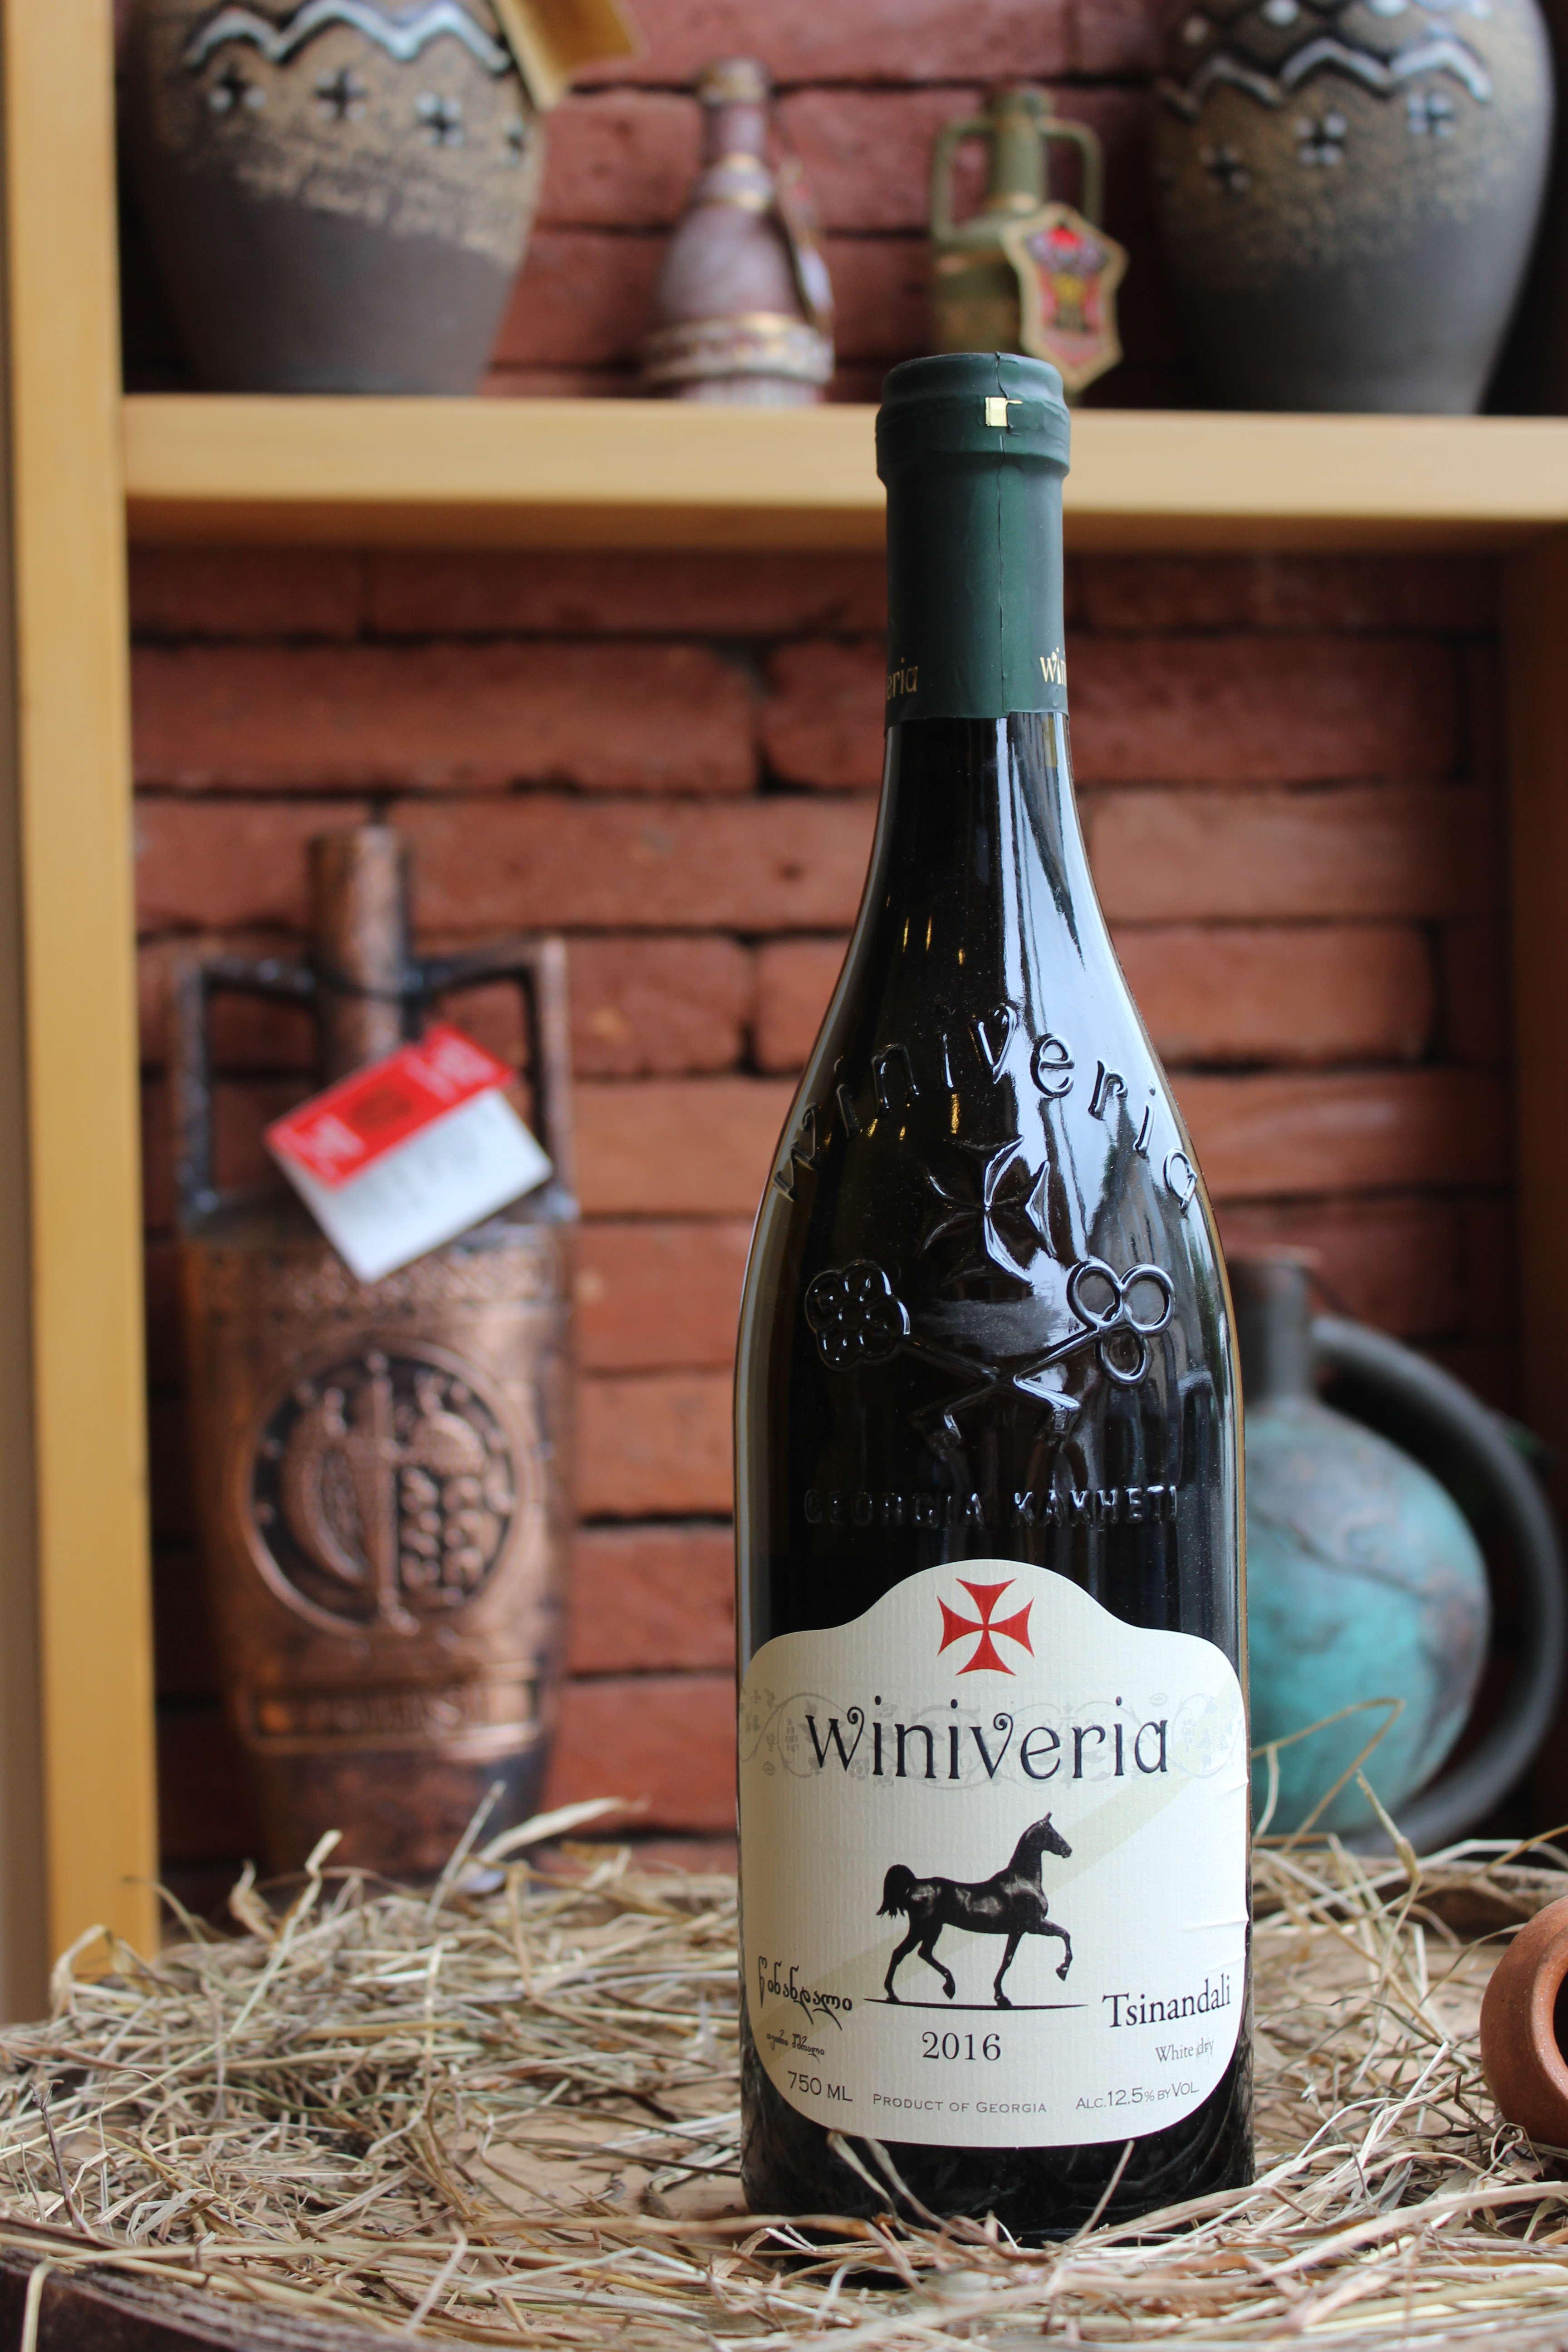 Winiveria - Tsinandali